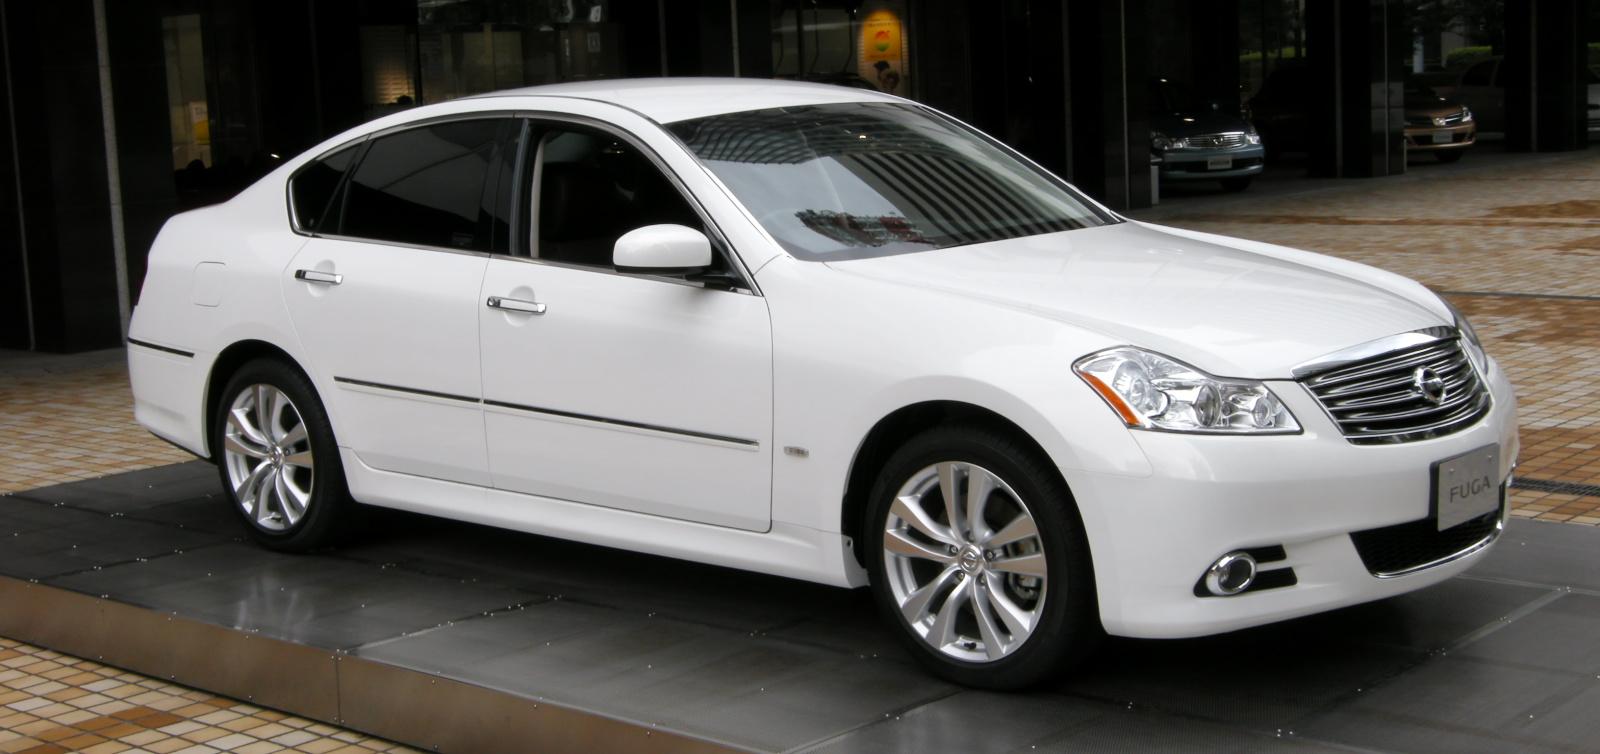 2011 Nissan Fuga